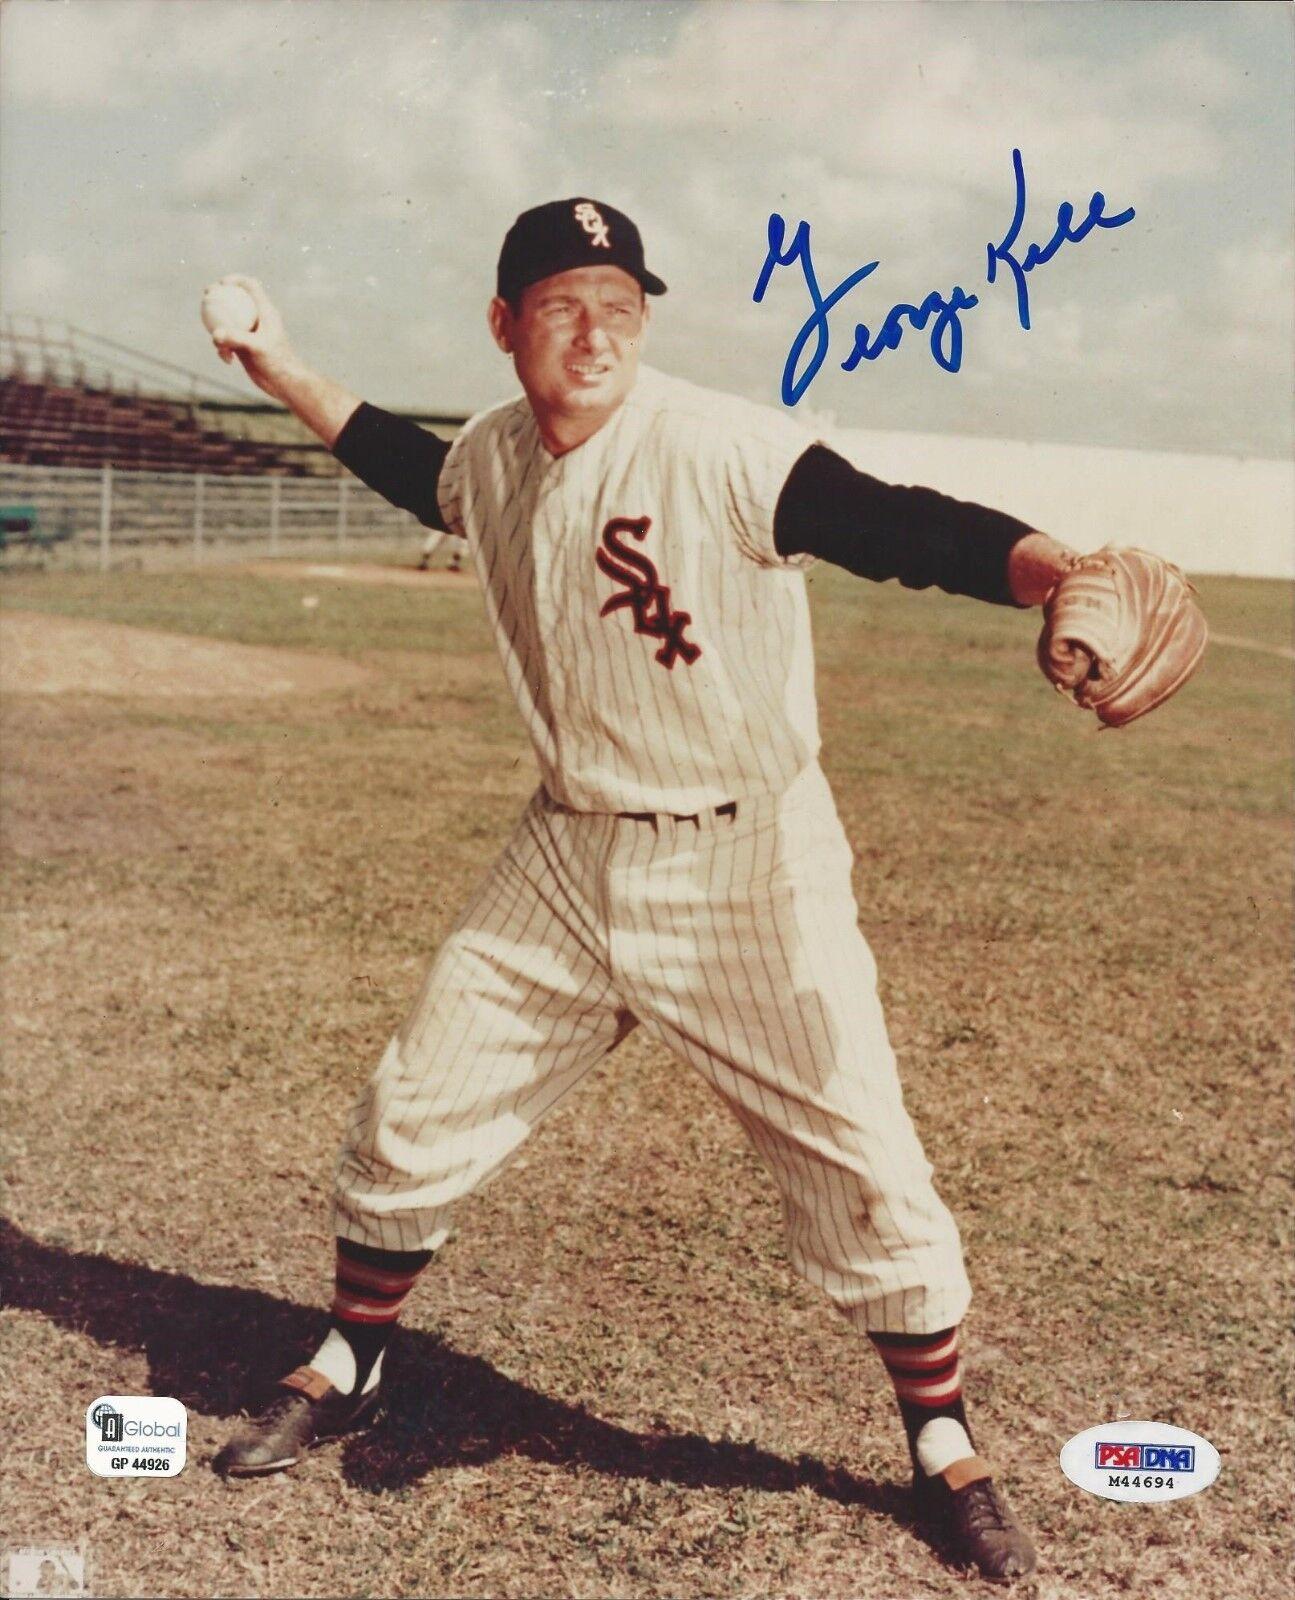 George Kell Chicago White Sox signed 8x10 photo GAI Cert# GP44694